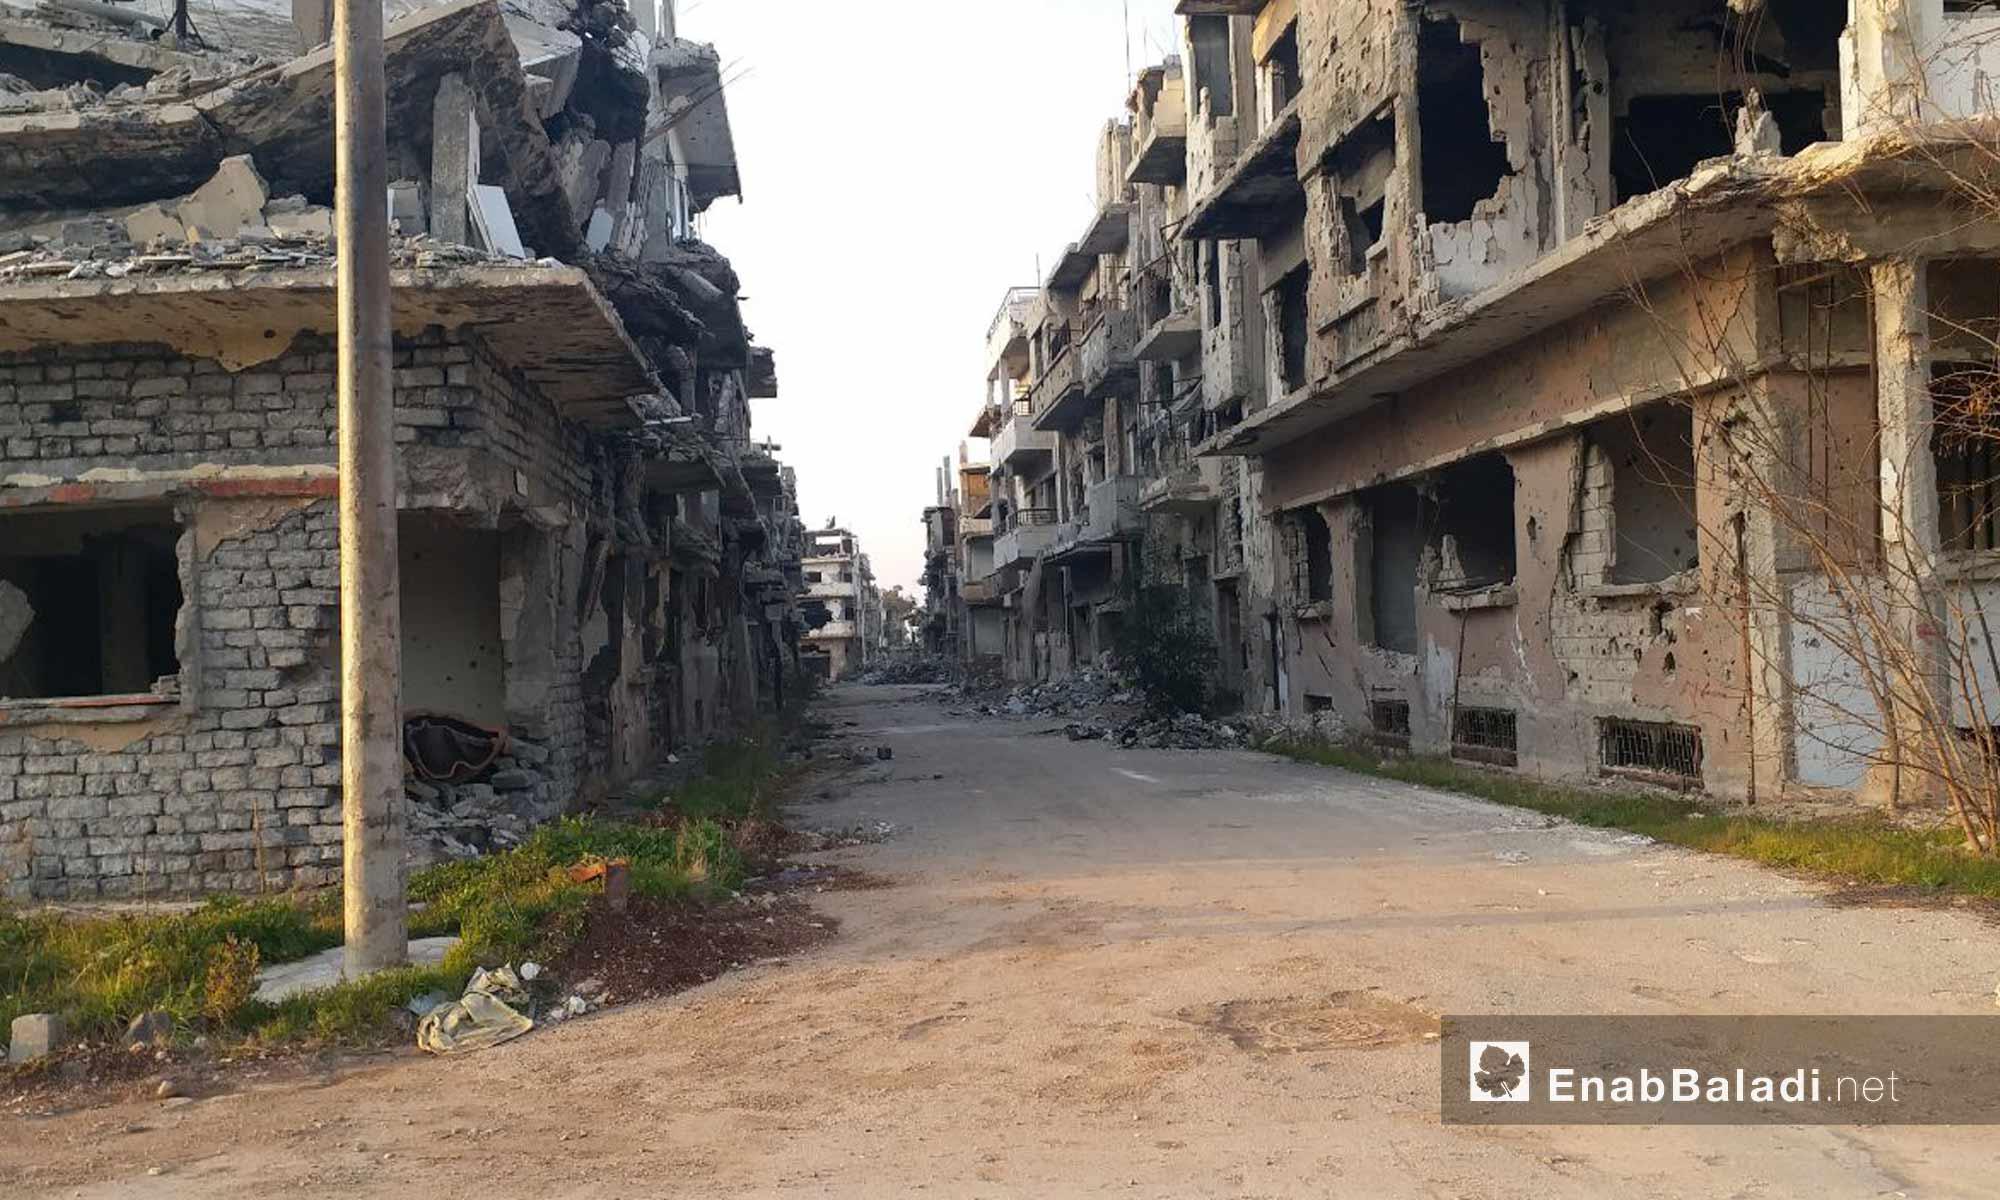 Streets of the al-Qarabis neighborhood in the city of Homs - January 24, 2019 (Enab Baladi)